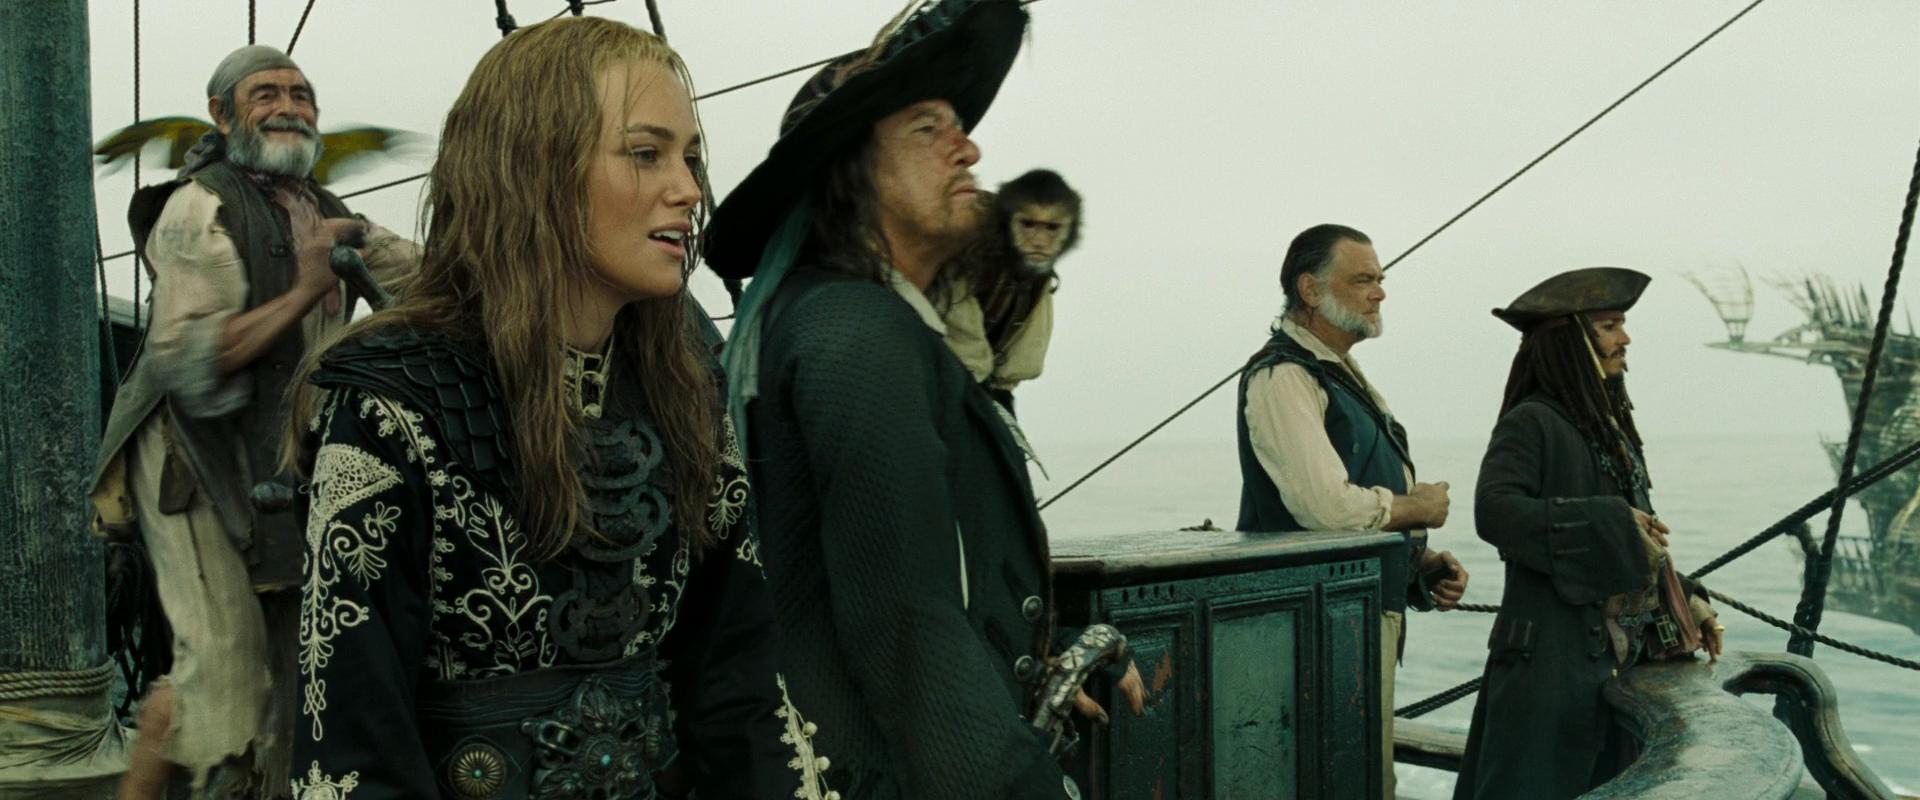 Parlay Piraten